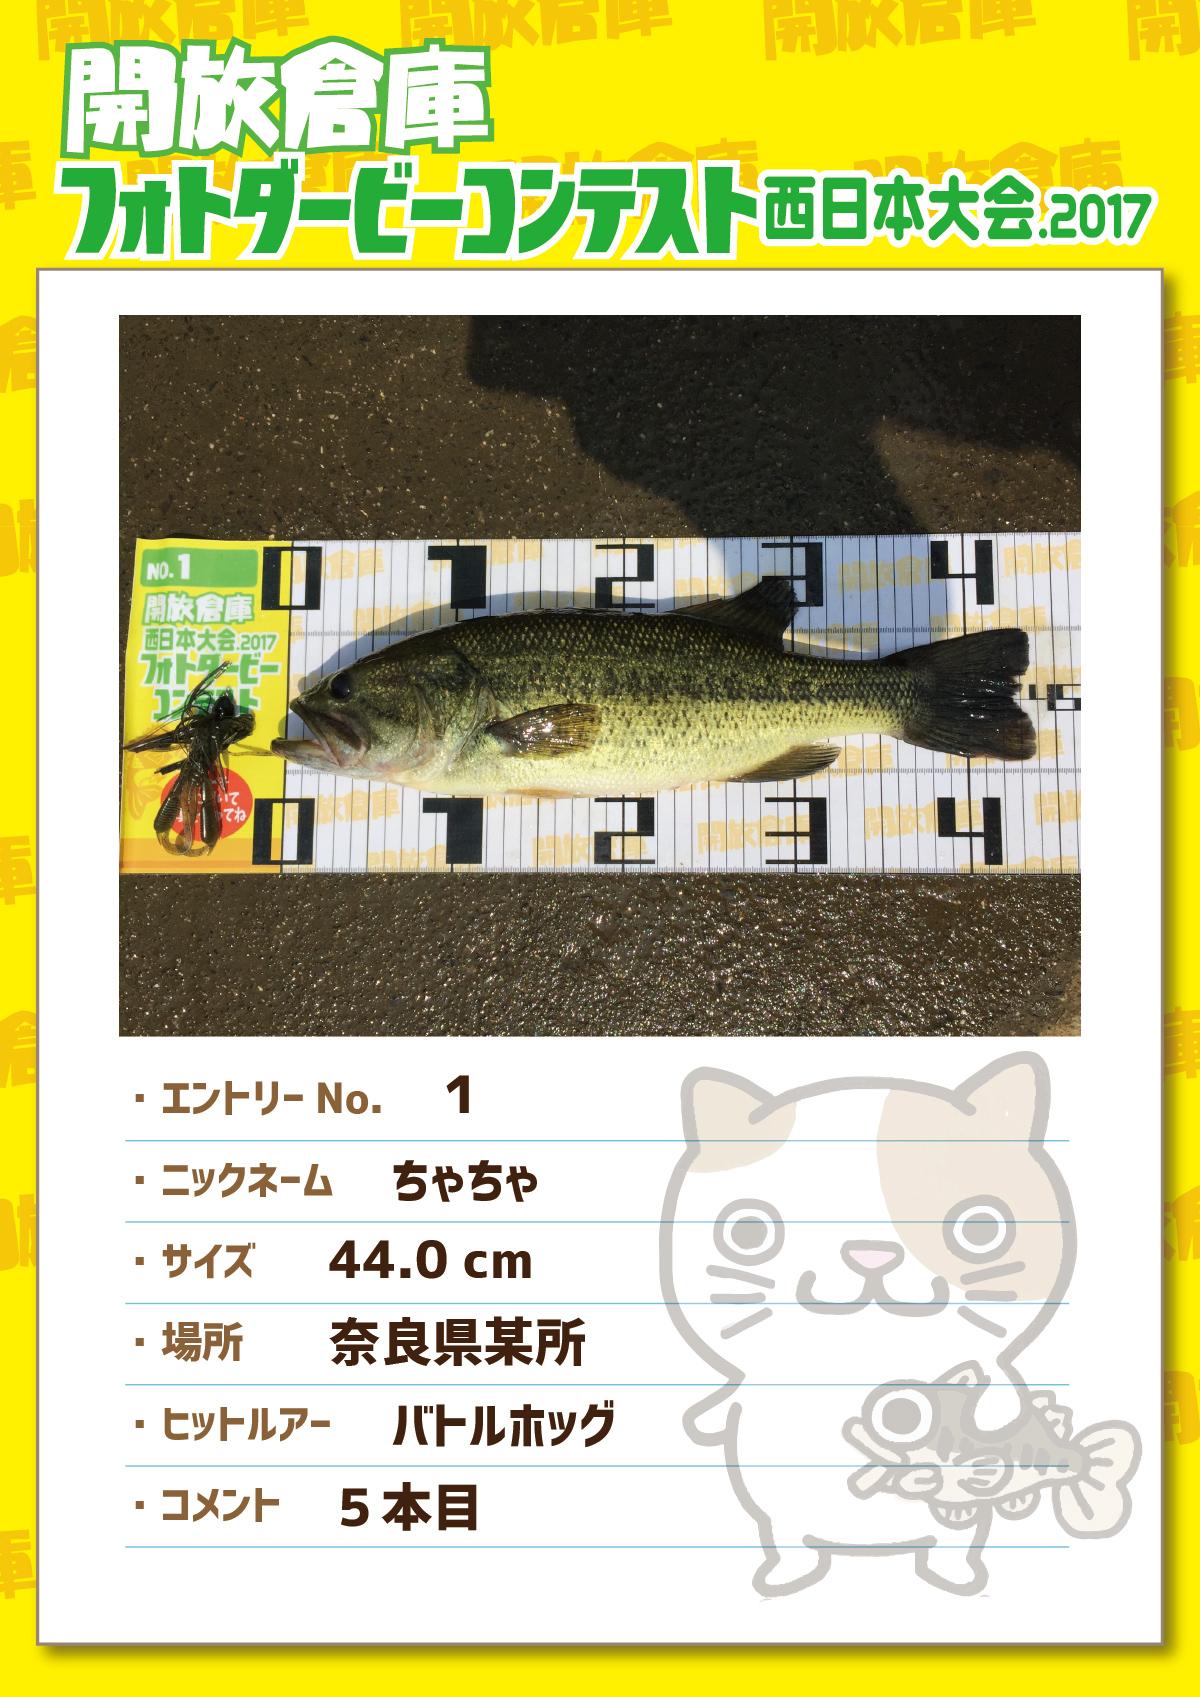 No.1 ちゃちゃ 44.0cm 奈良県某所 バトルホッグ 5本目